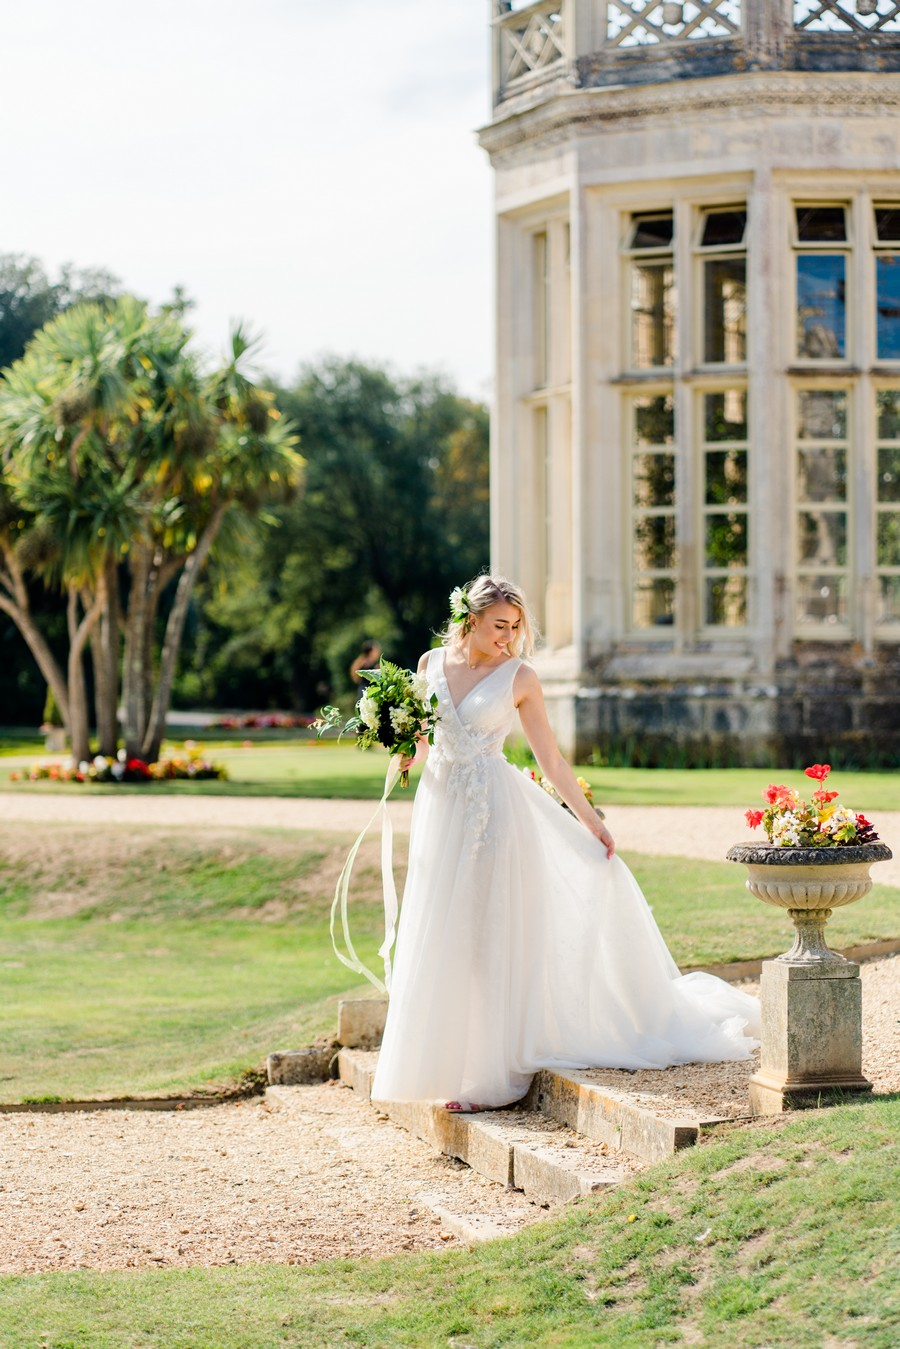 Highcliffe Castle wedding inspiration on the English Wedding Blog (34)